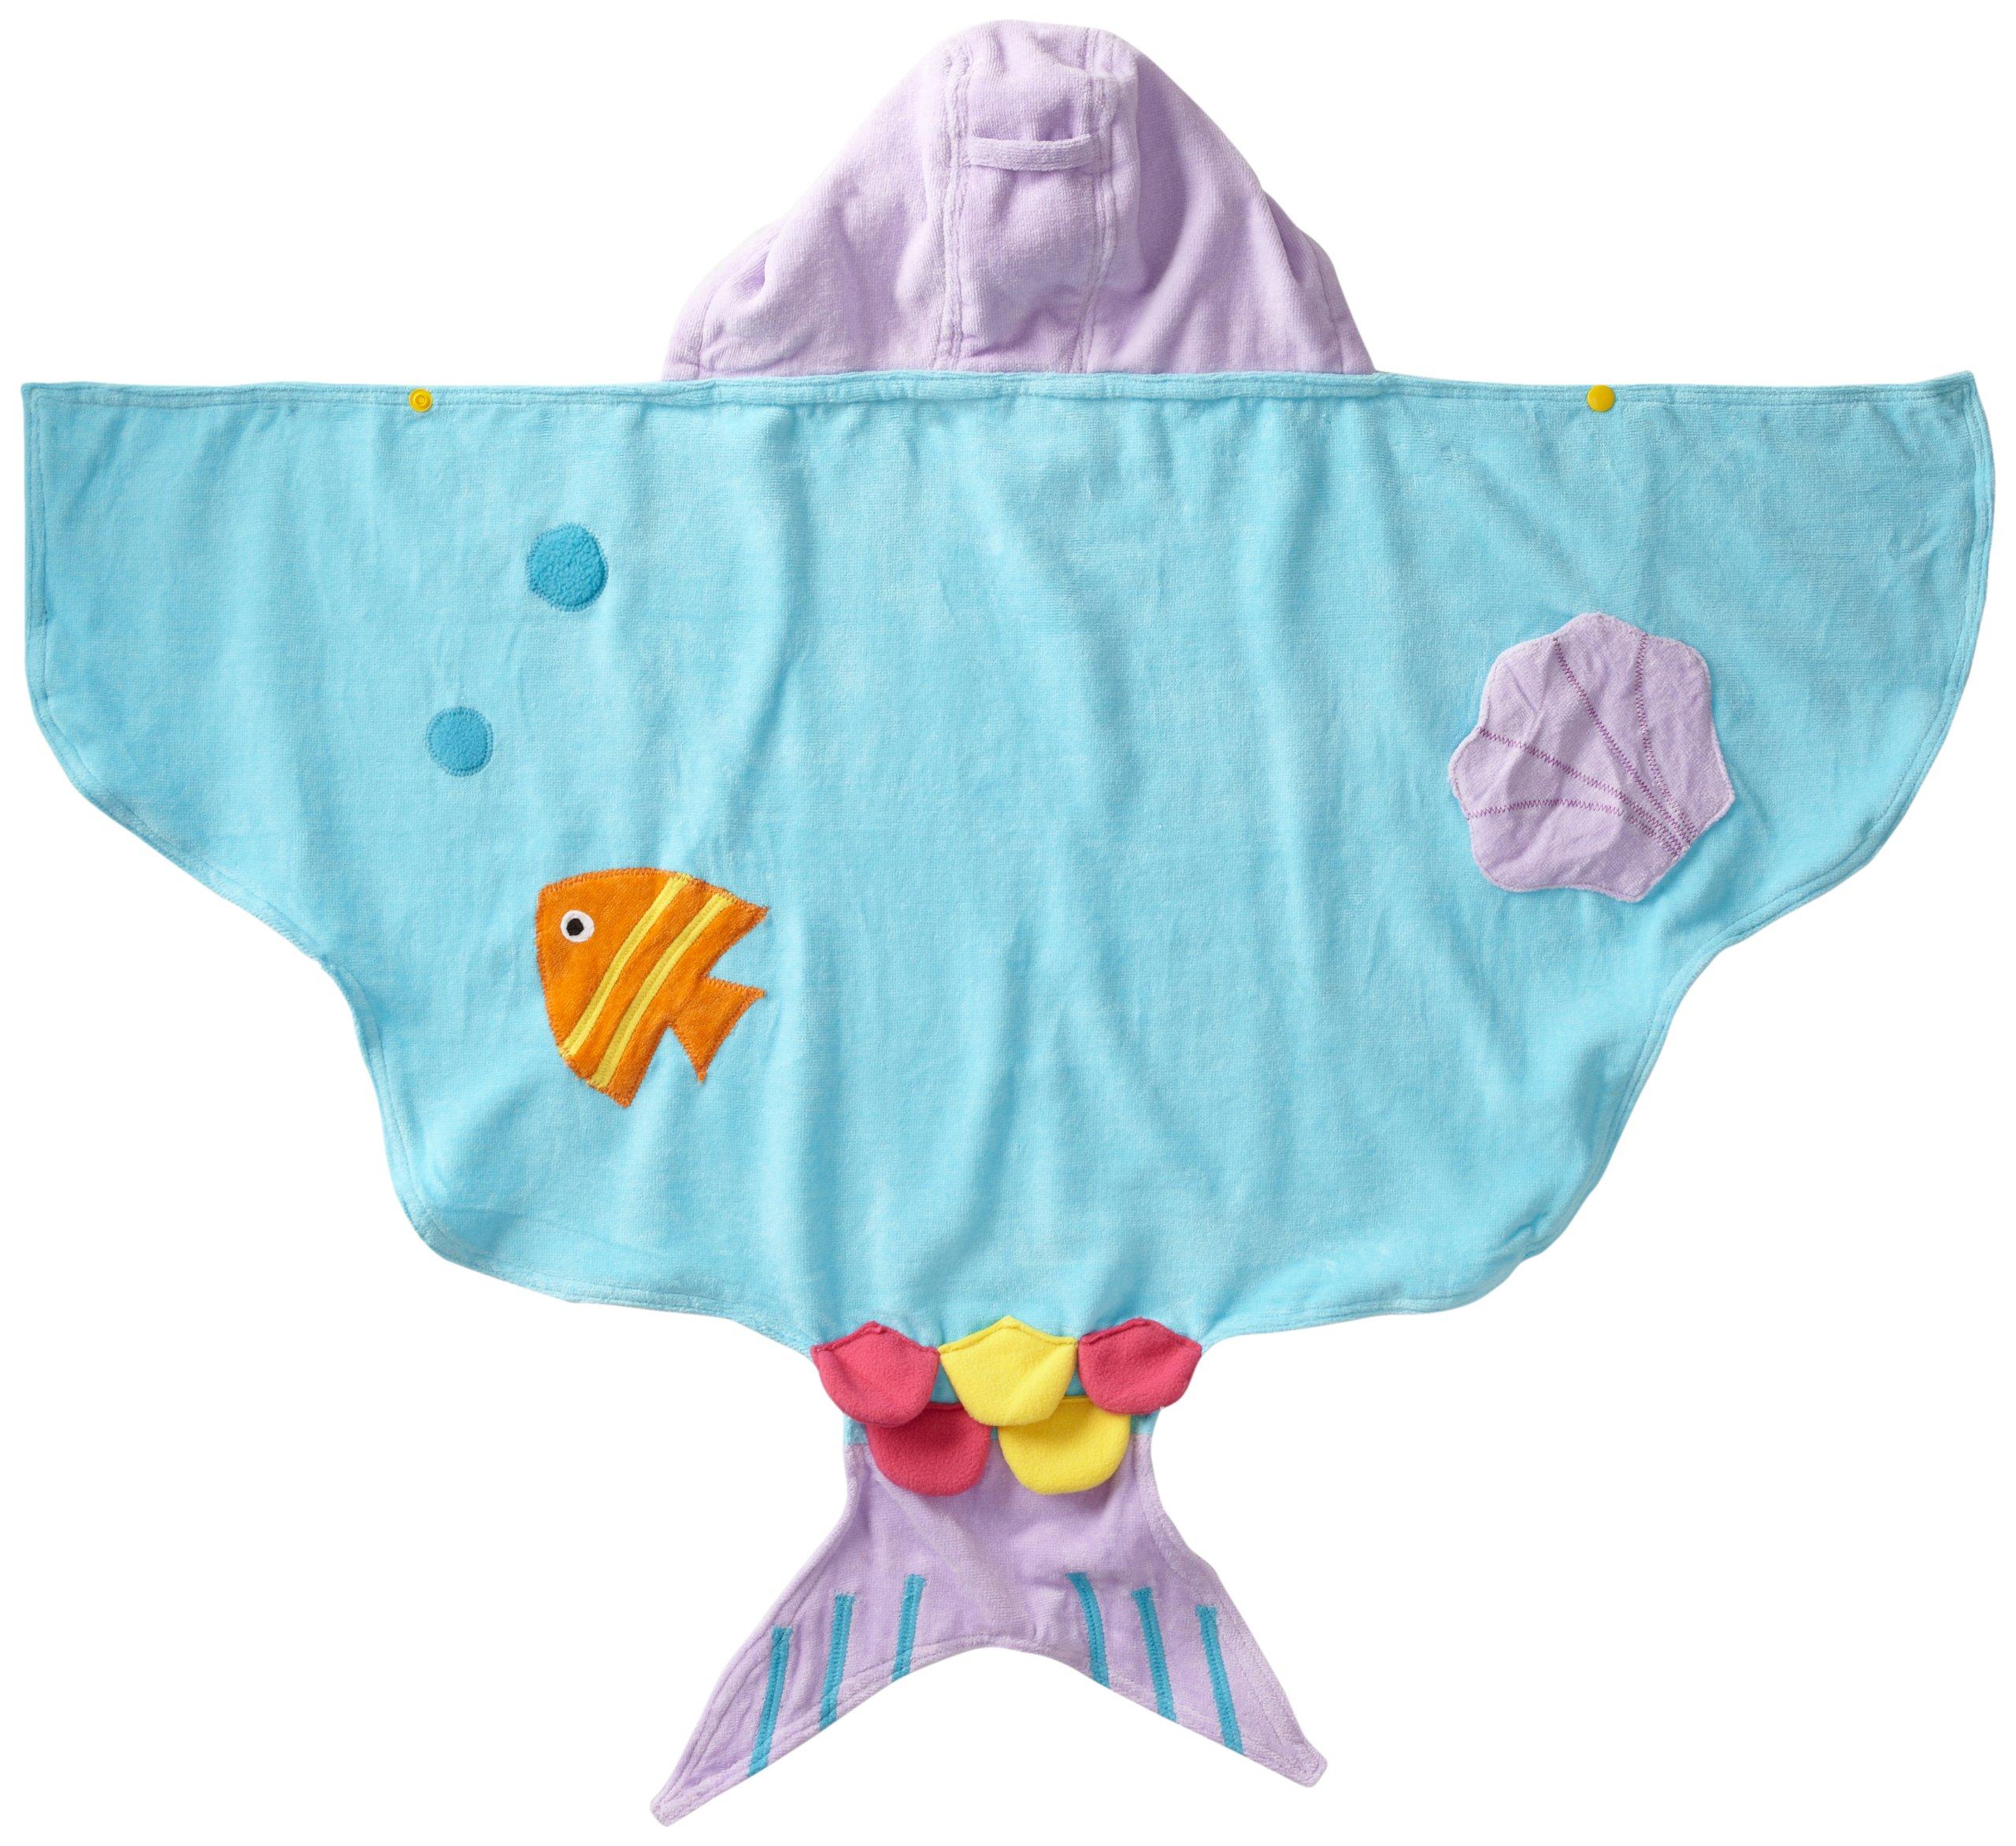 Kidorable - Toalla con capucha para niñas con cola de pescado y conchas 2